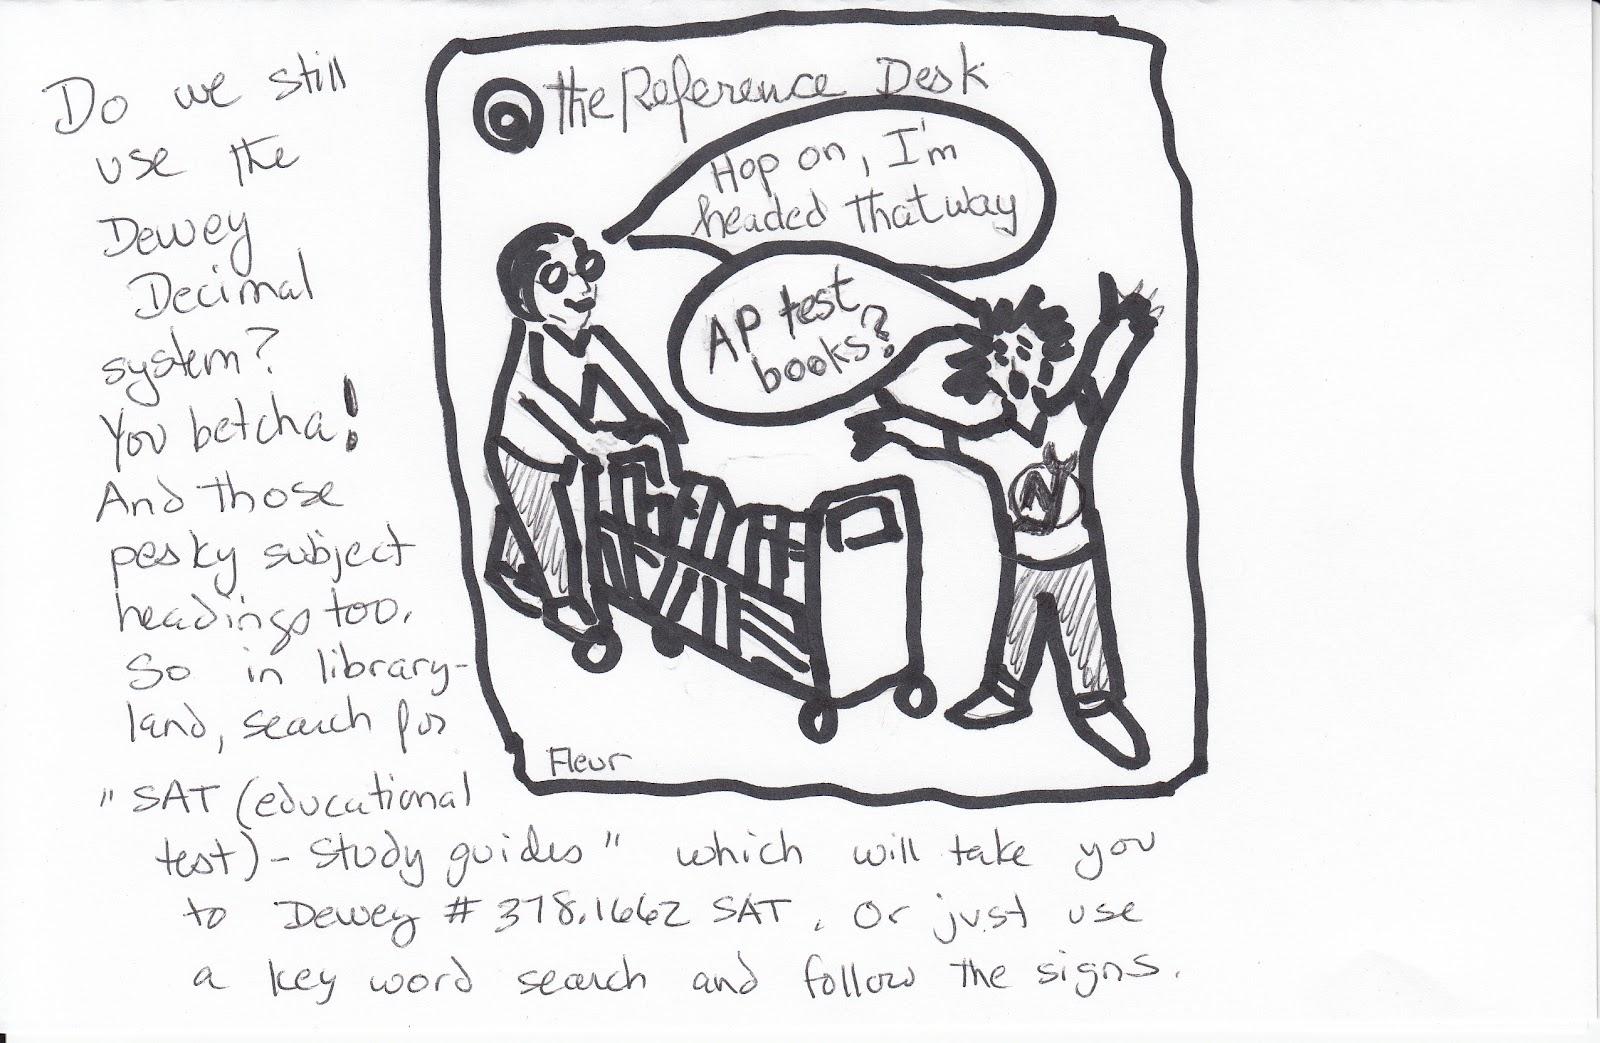 Berkeley Heights Public Library Book Blog Is The Dewey